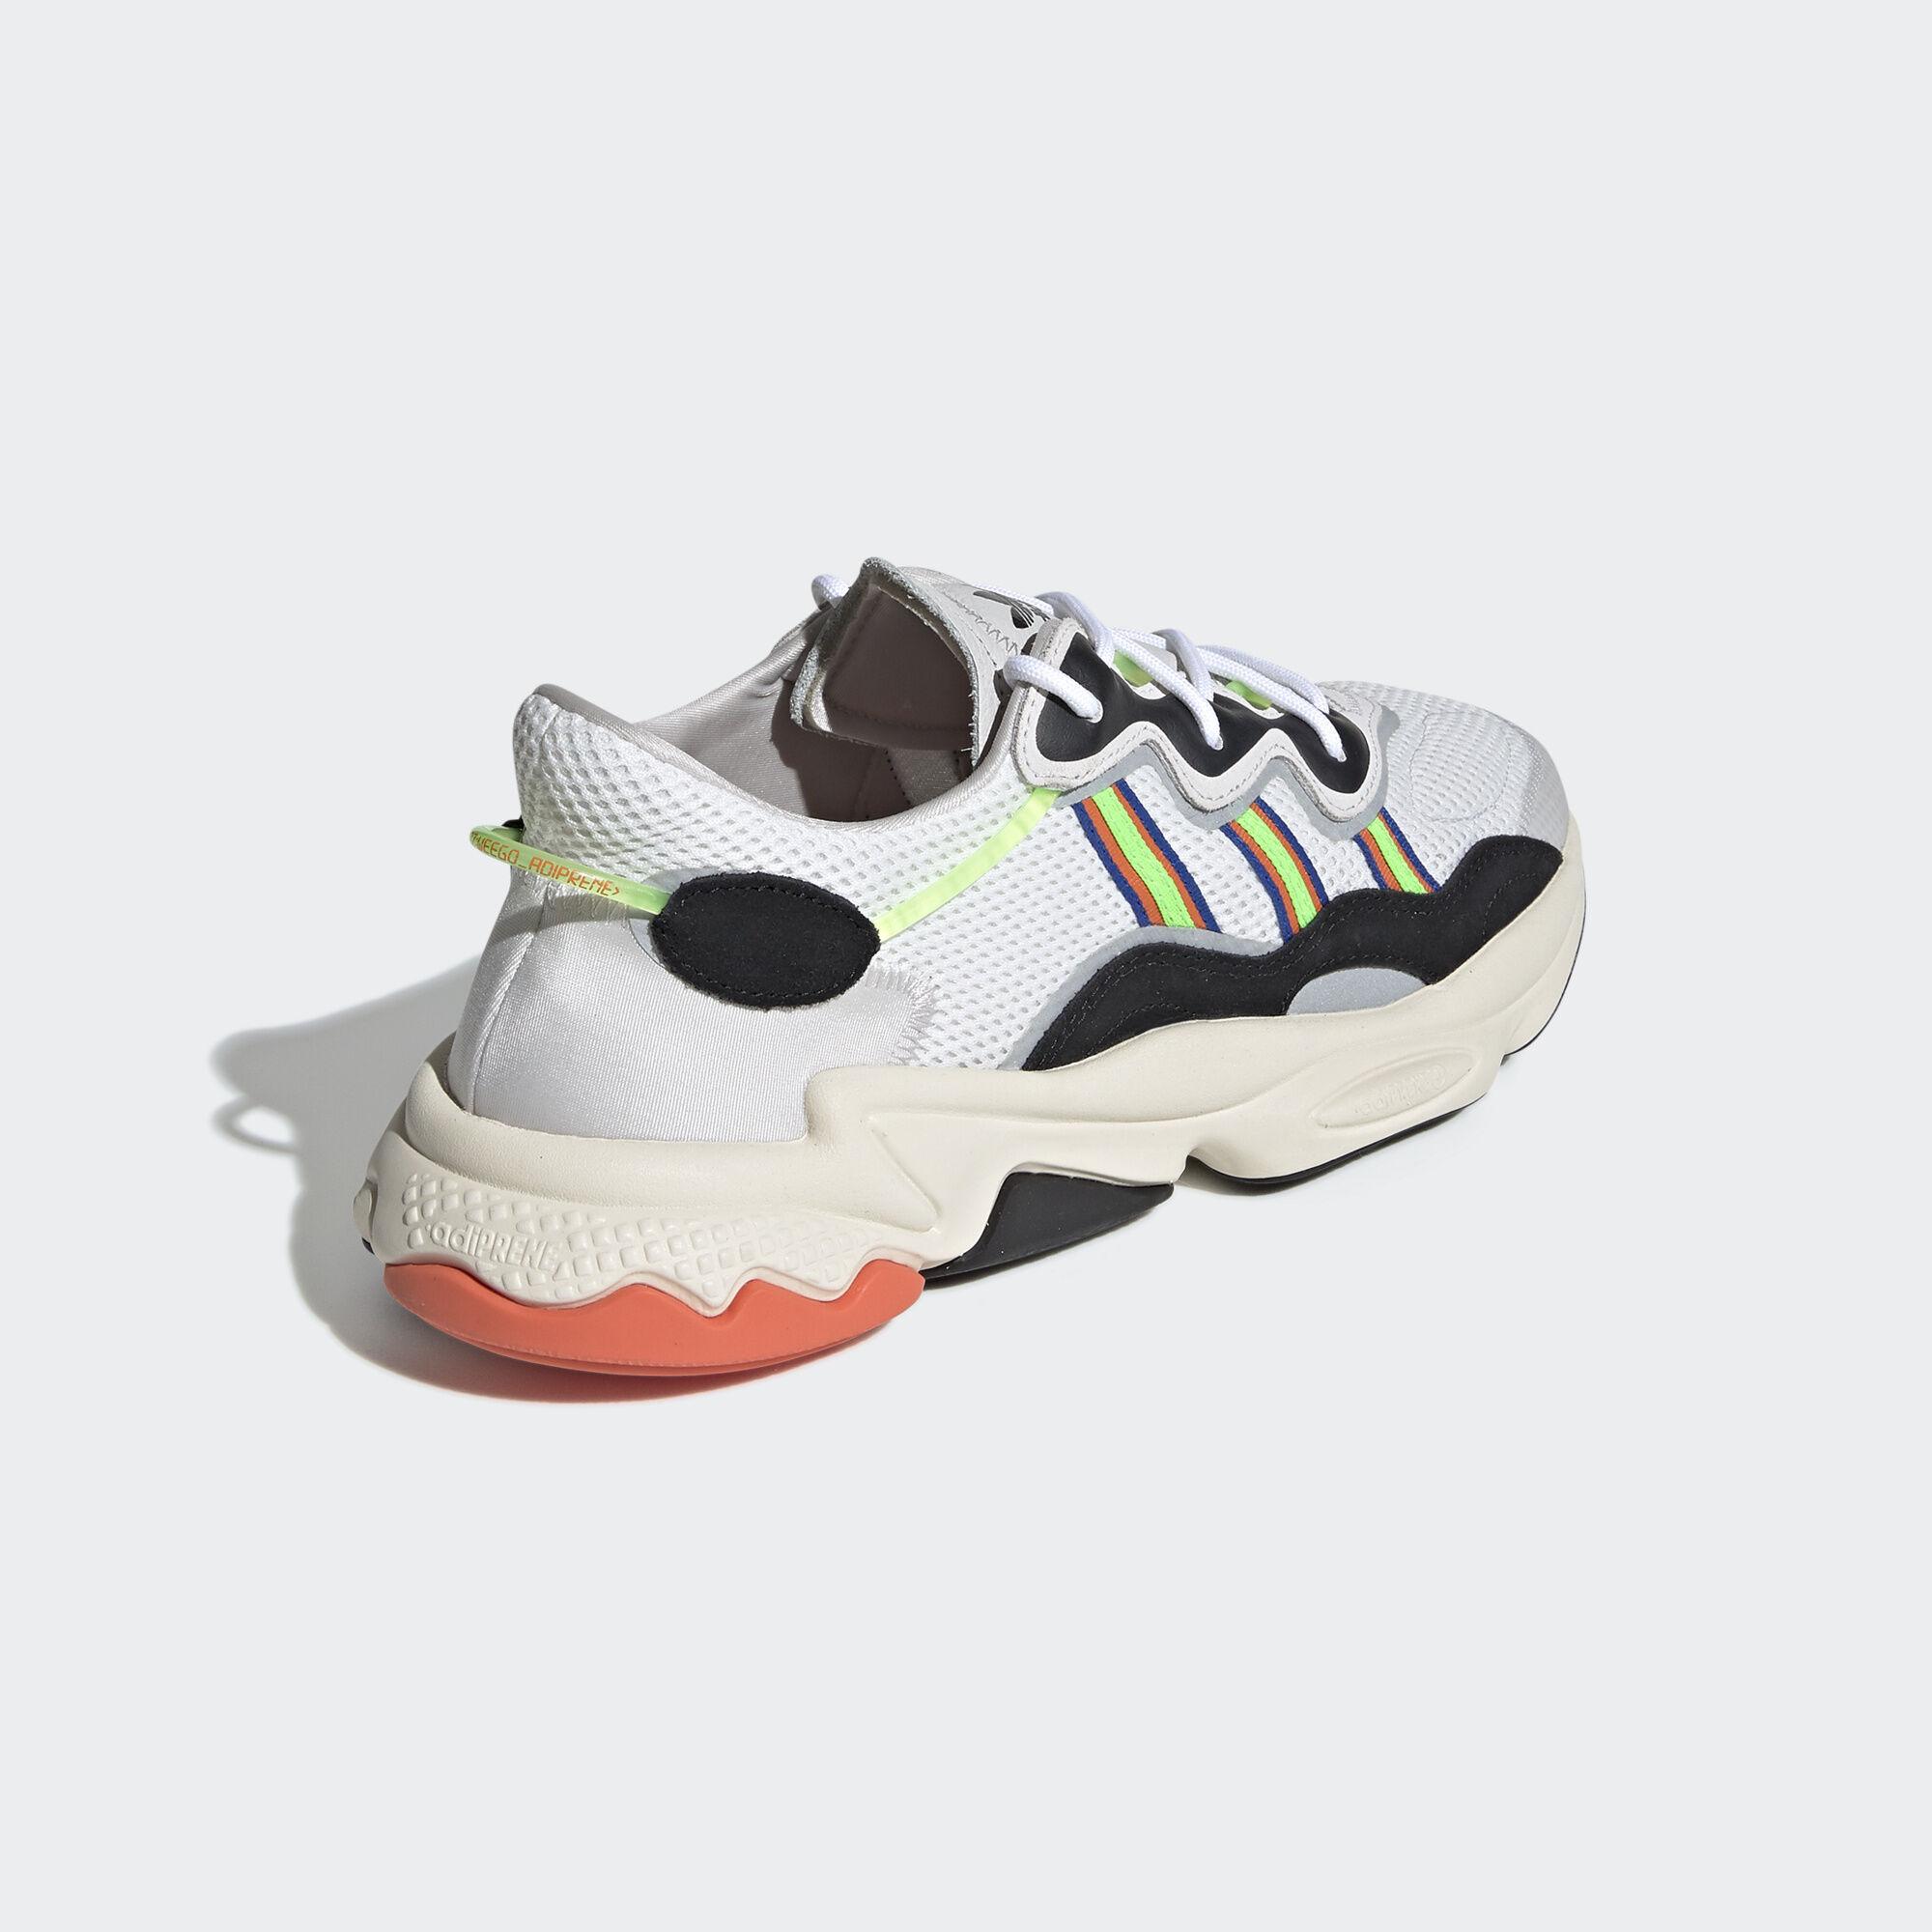 Adidas Originals Ozweego Cloud WhiteSolar GreenCloud White